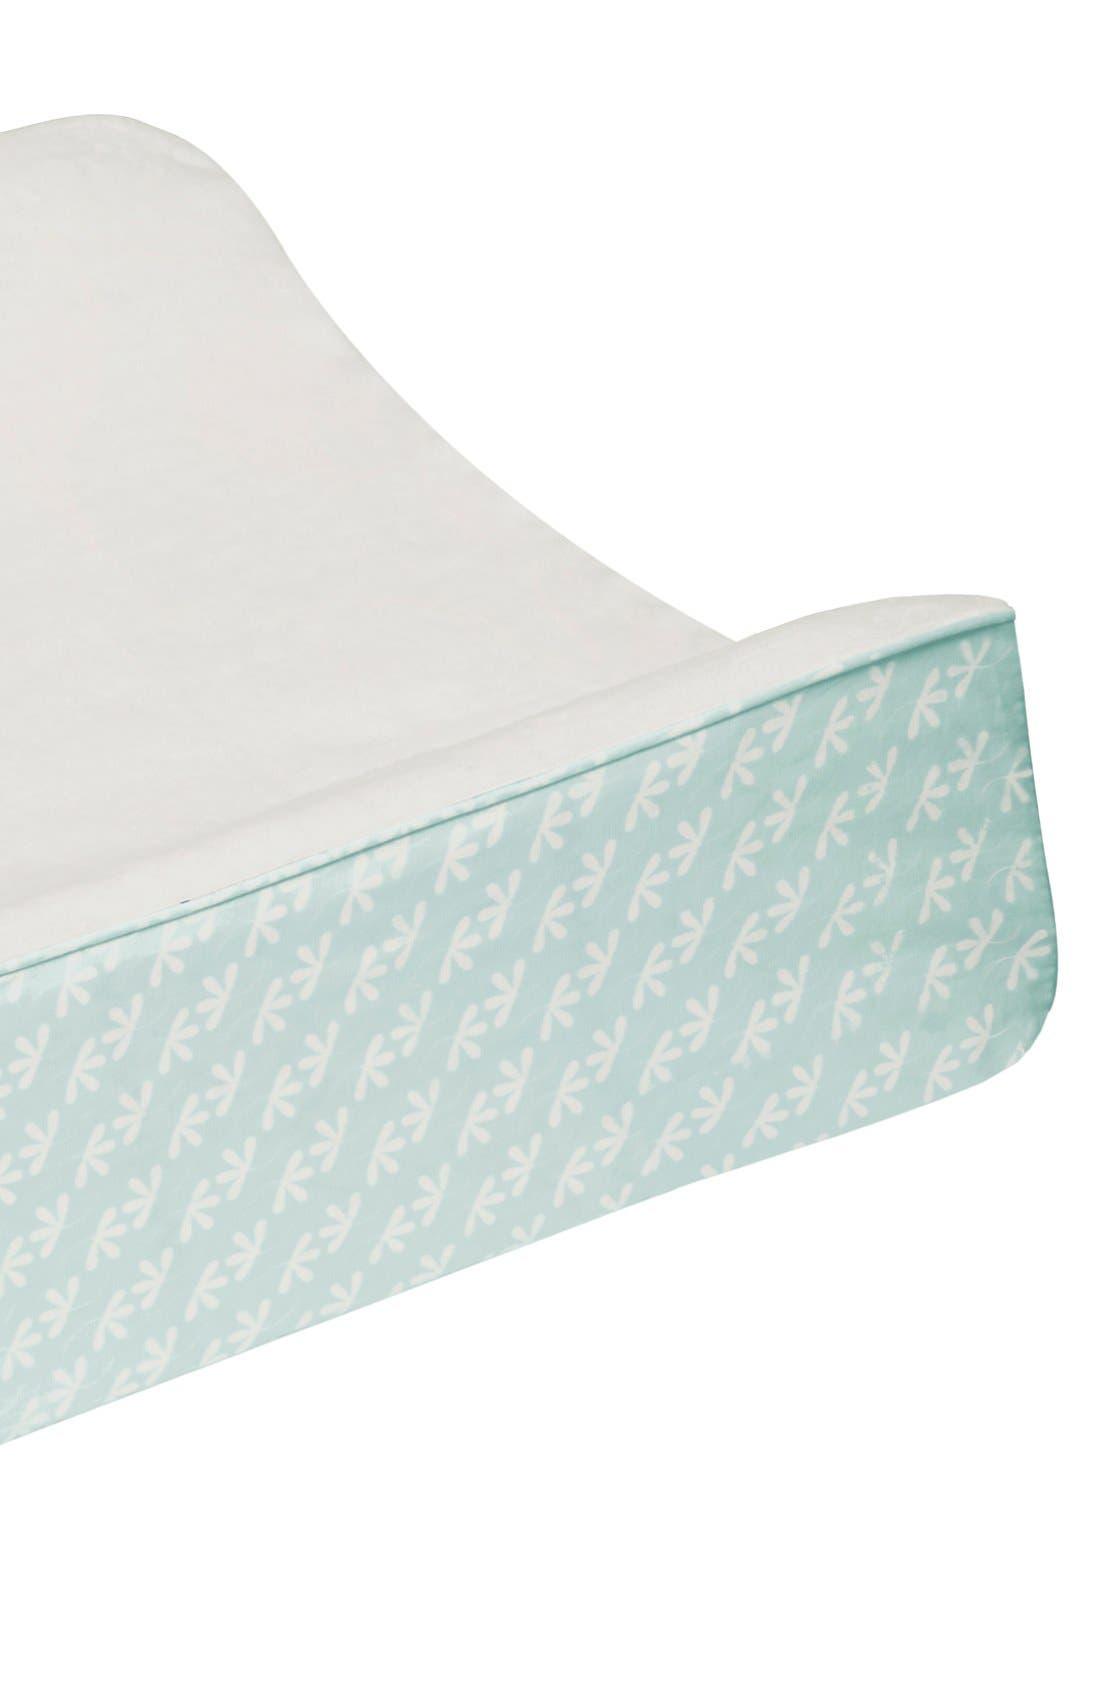 'Flora' Crib Sheet, Crib Skirt, Changing Pad Cover, Blanket & Wall Decals,                             Alternate thumbnail 6, color,                             400